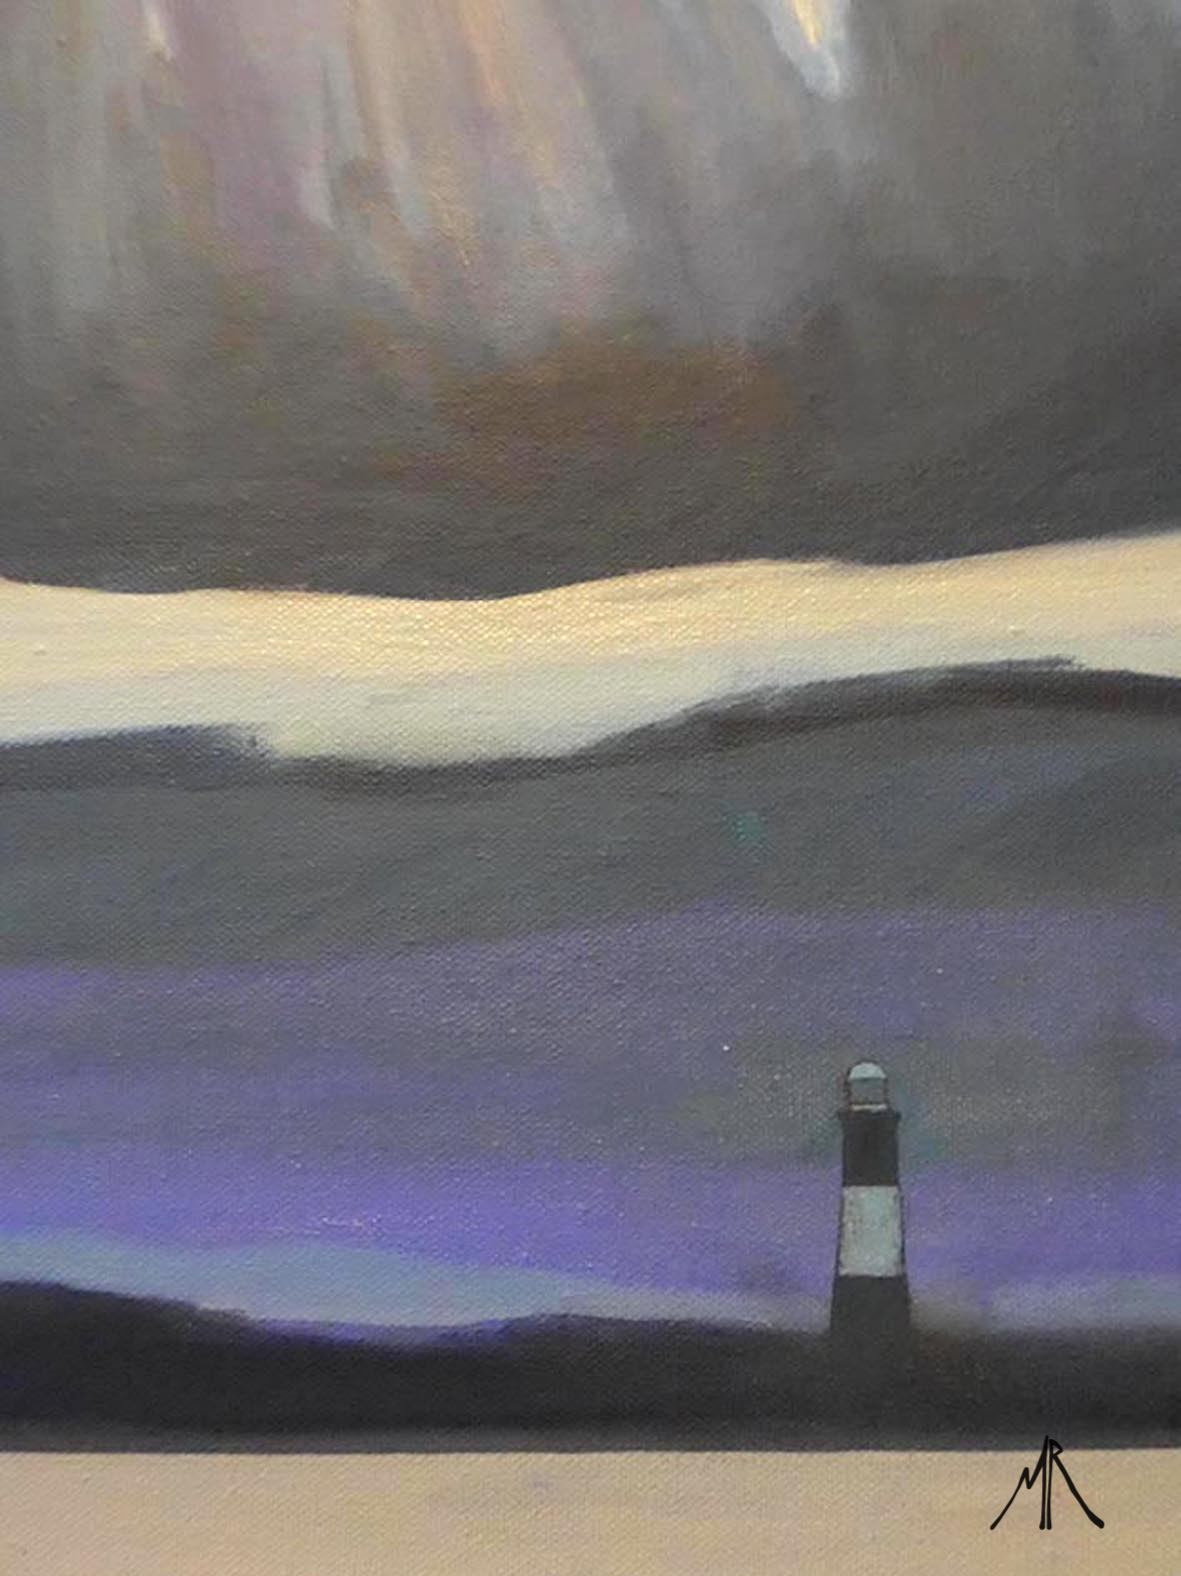 Spurn Lighthouse detail from Angel Wings Over Spurn Point Lighthouse.jpg